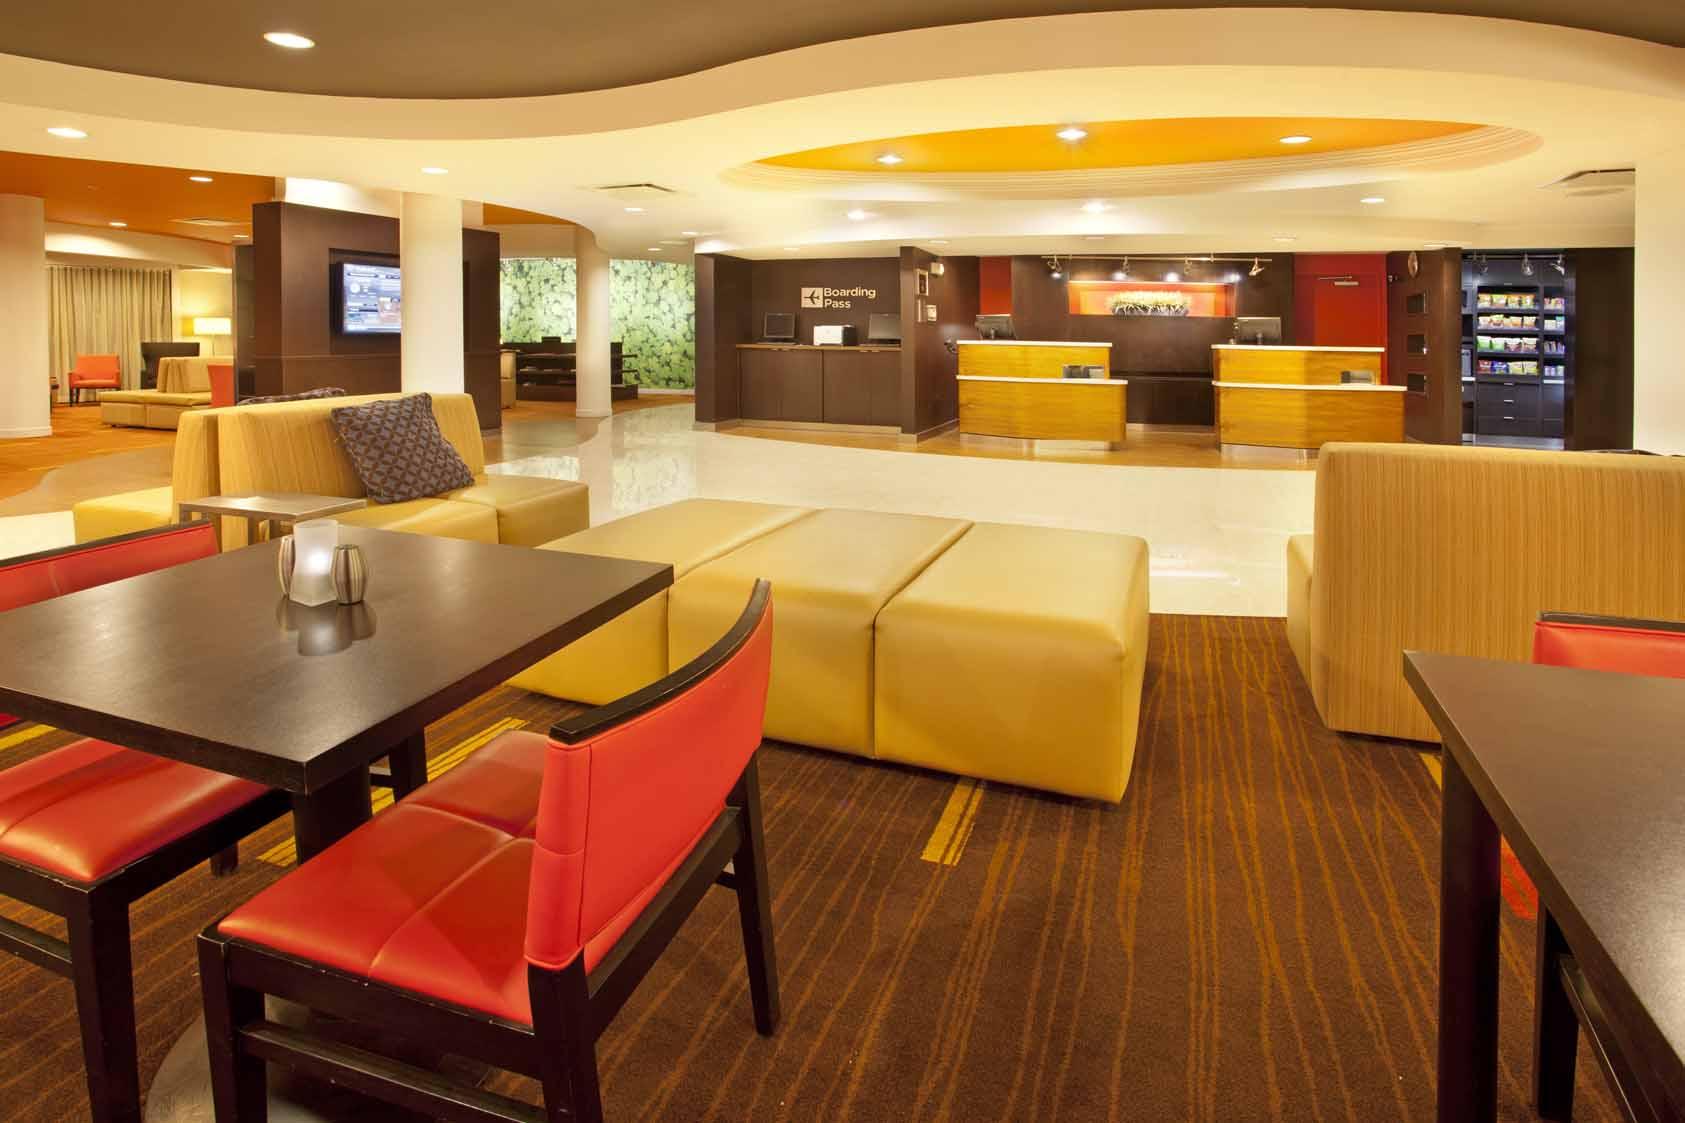 Courtyard Inn El Paso, TX: Lobby